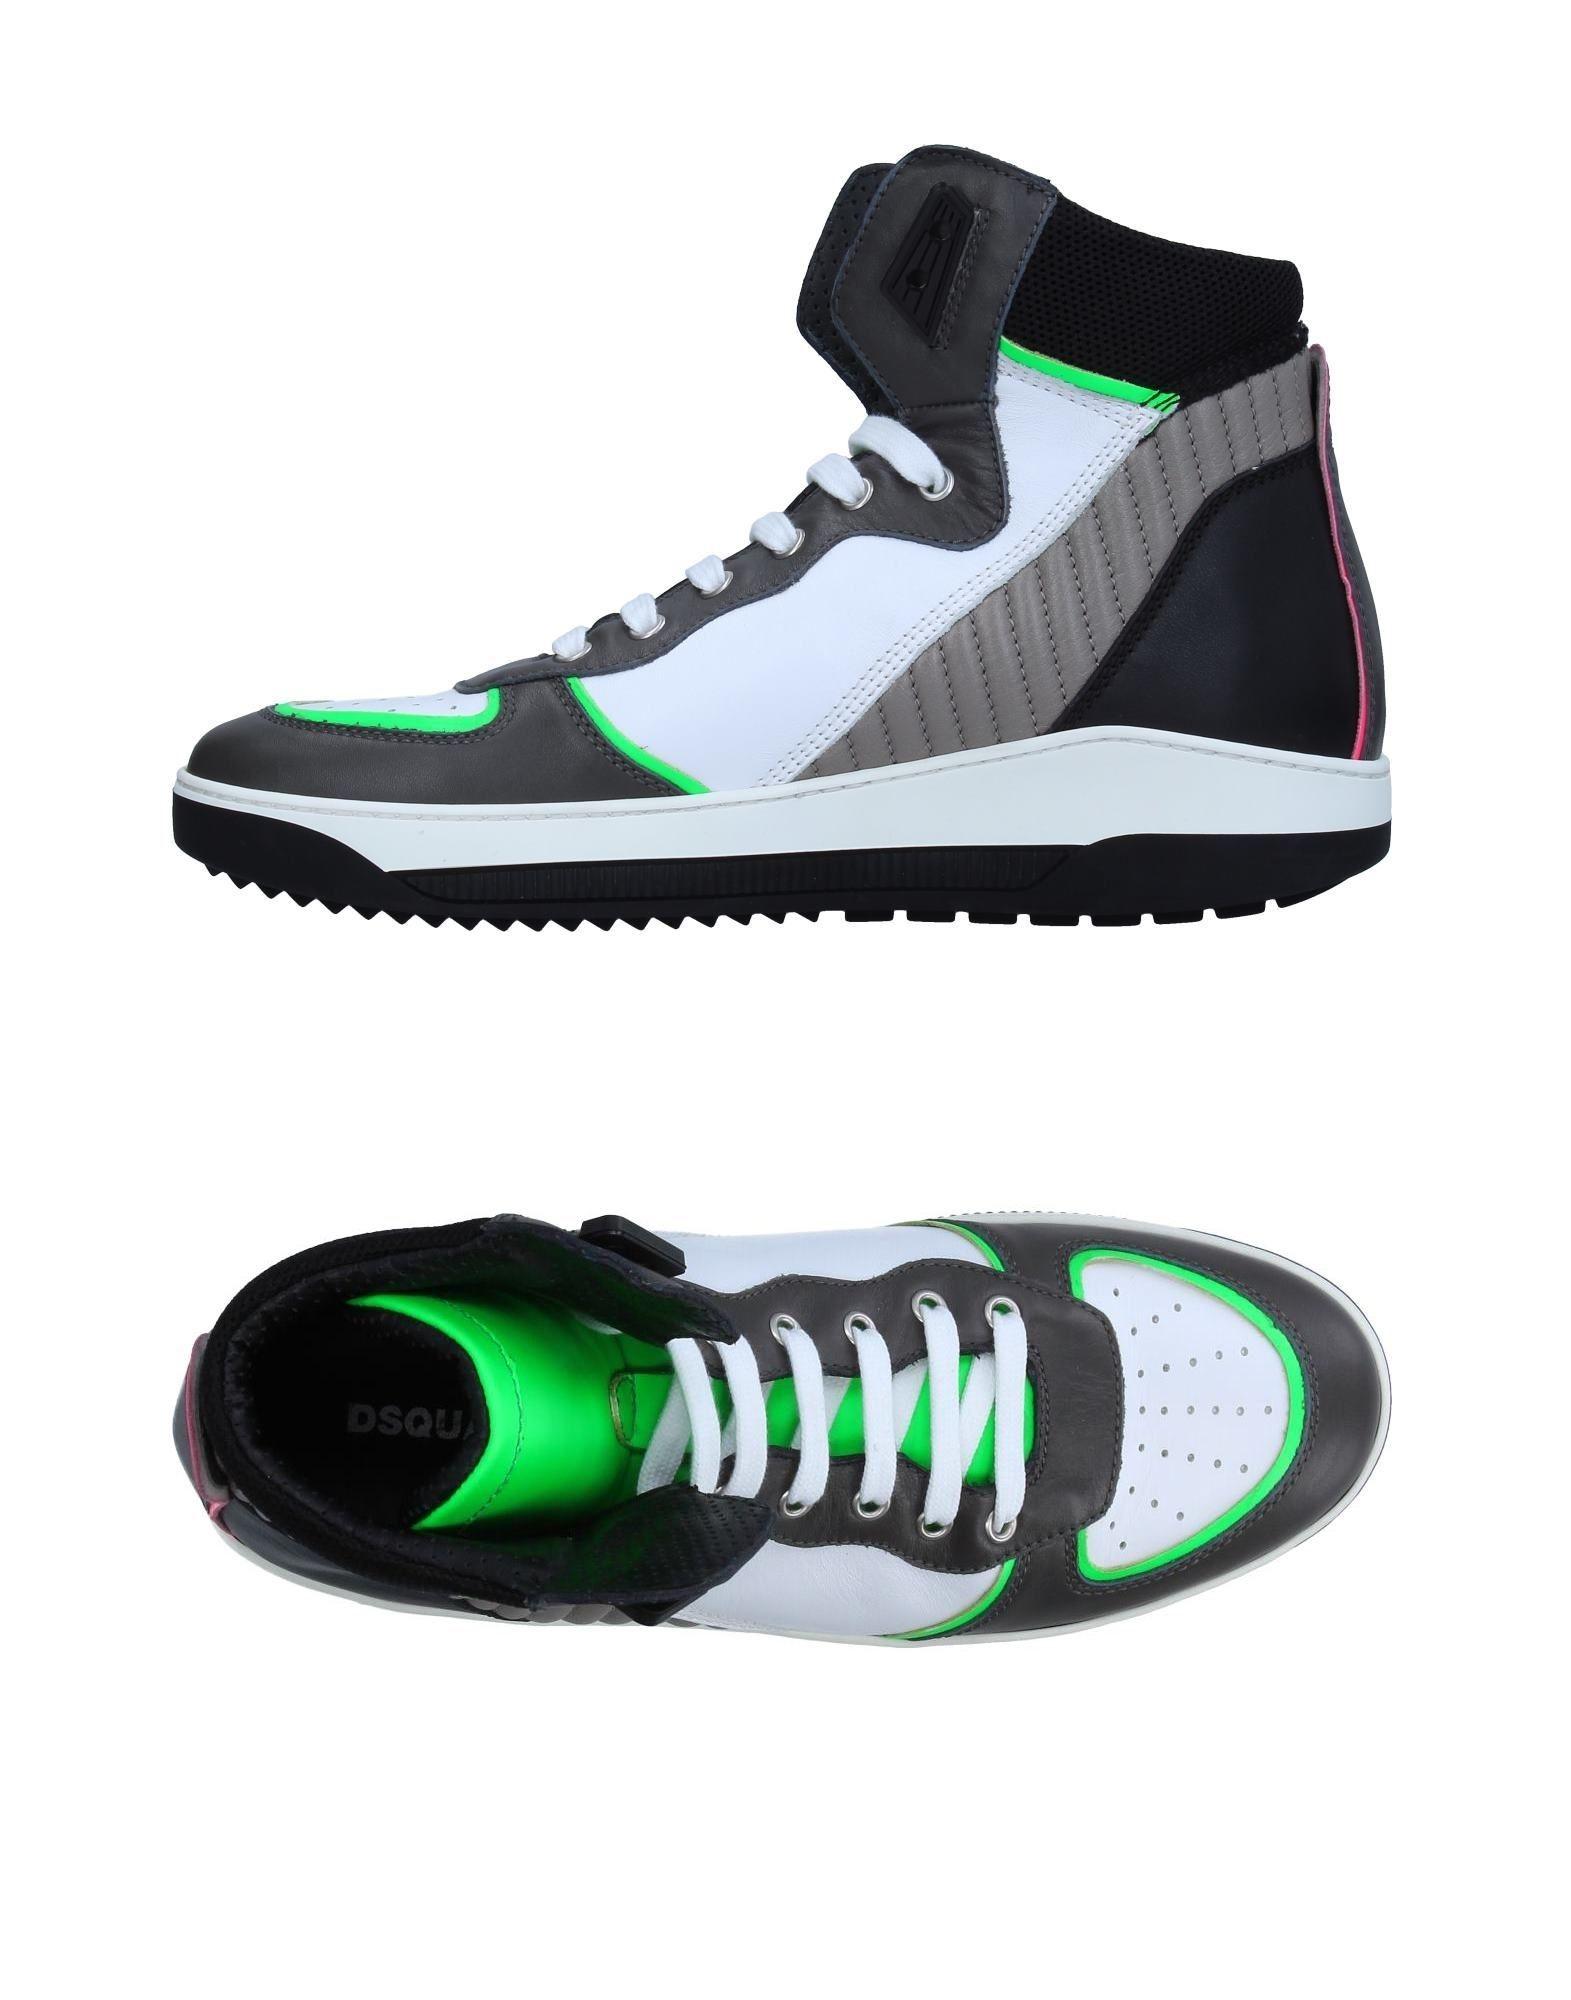 Dsquared2 Gute Sneakers Herren  11332830NW Gute Dsquared2 Qualität beliebte Schuhe 978920